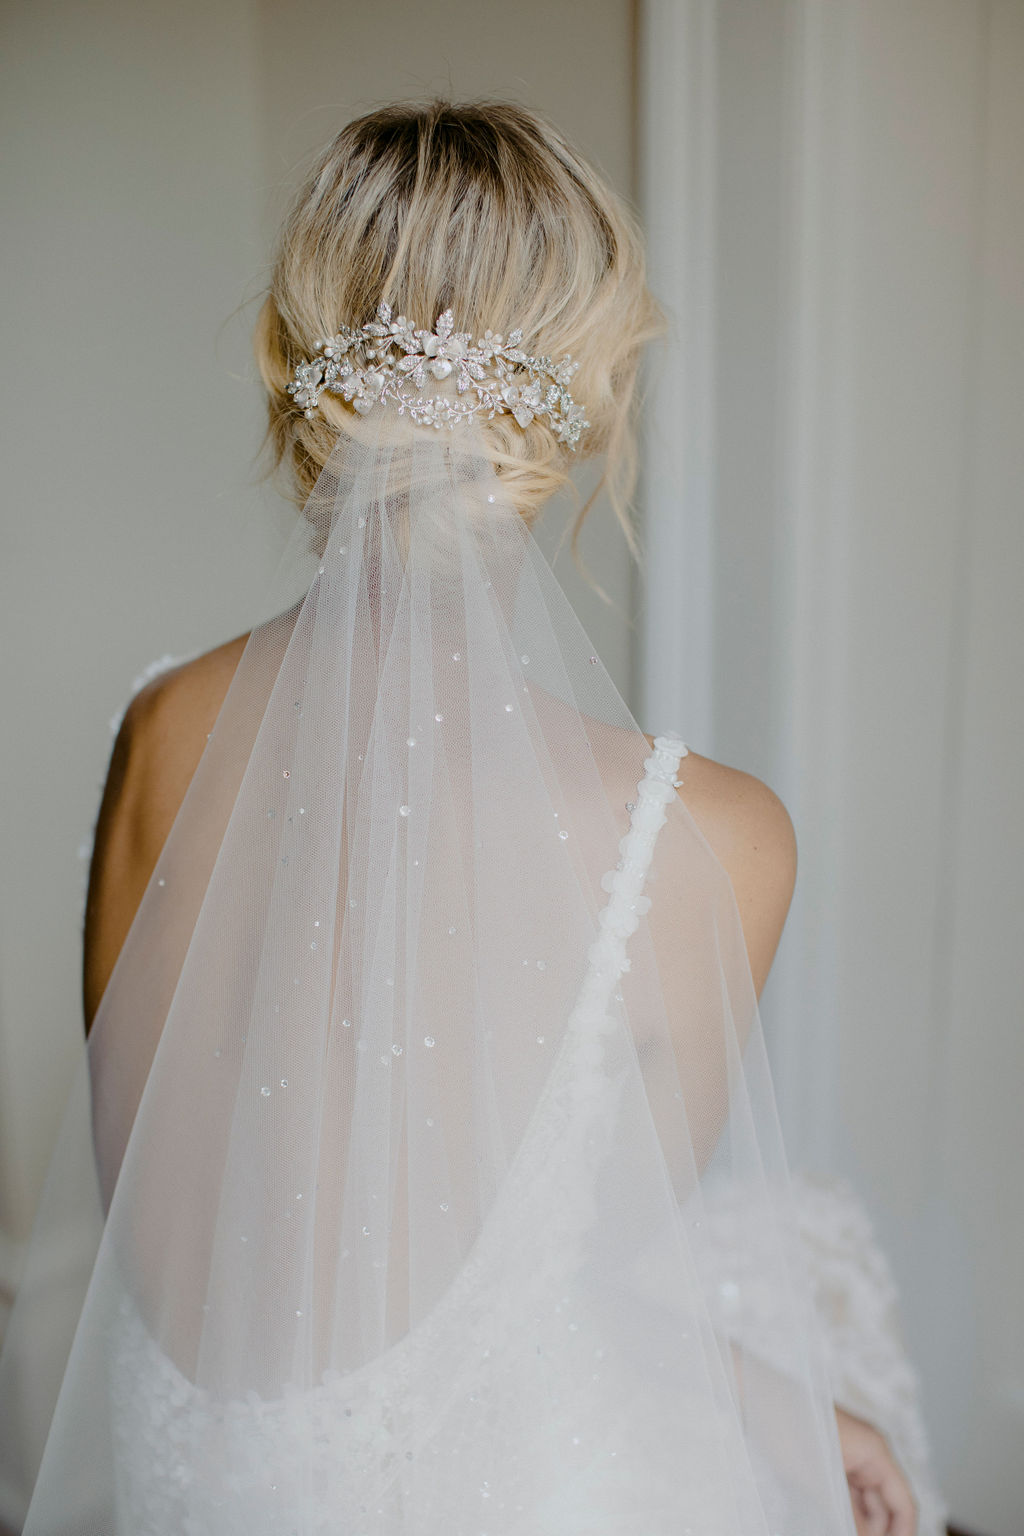 EVENING | CRYSTAL WEDDING HEADPIECE & MORNING MIST VEIL by TANIA MARAS